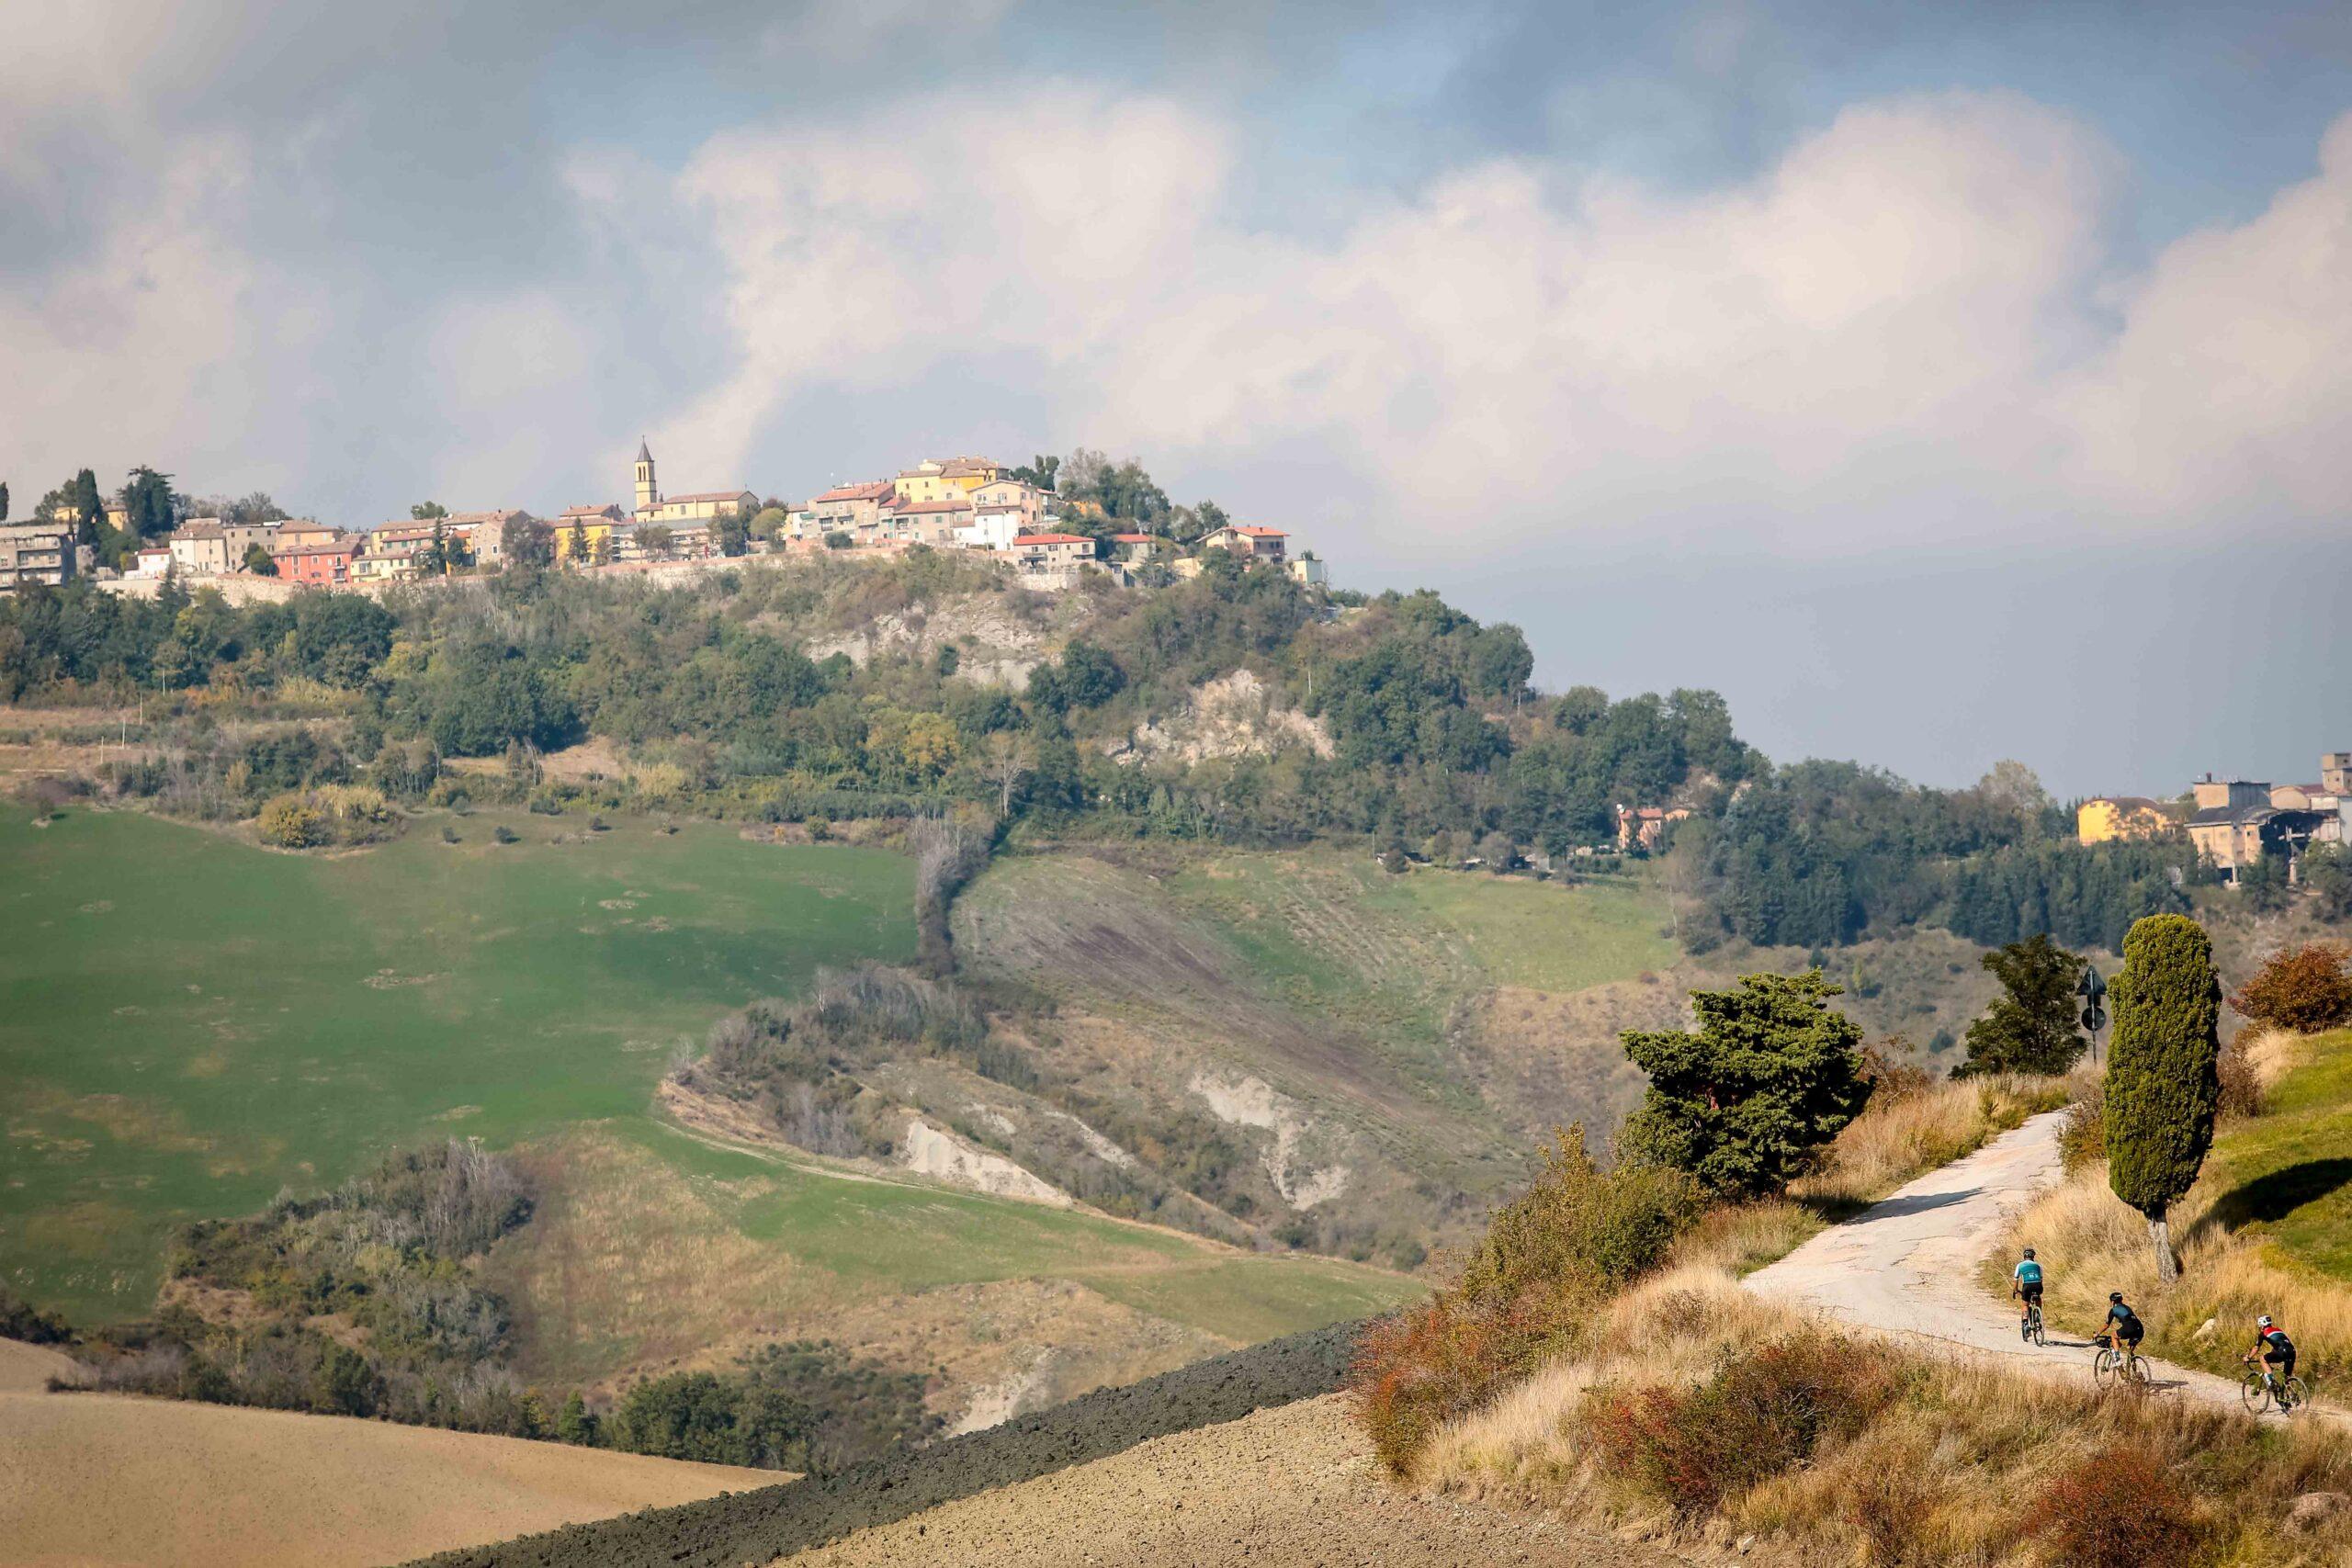 Via Panoramica tour